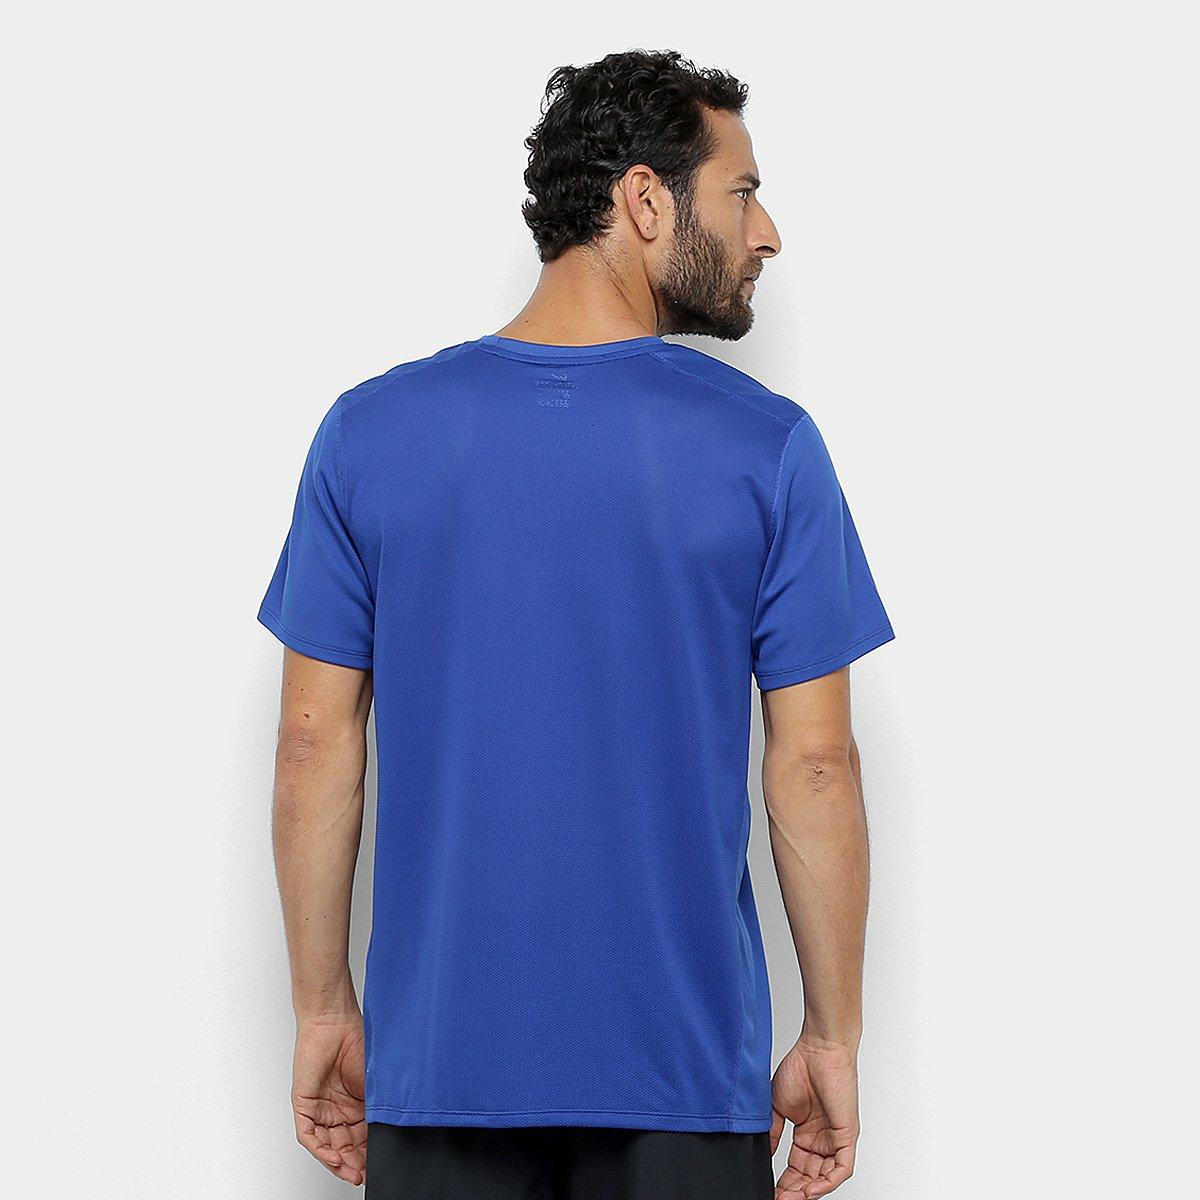 Camiseta Nike DRI-FIT Run Masculina - Tam: P - 1